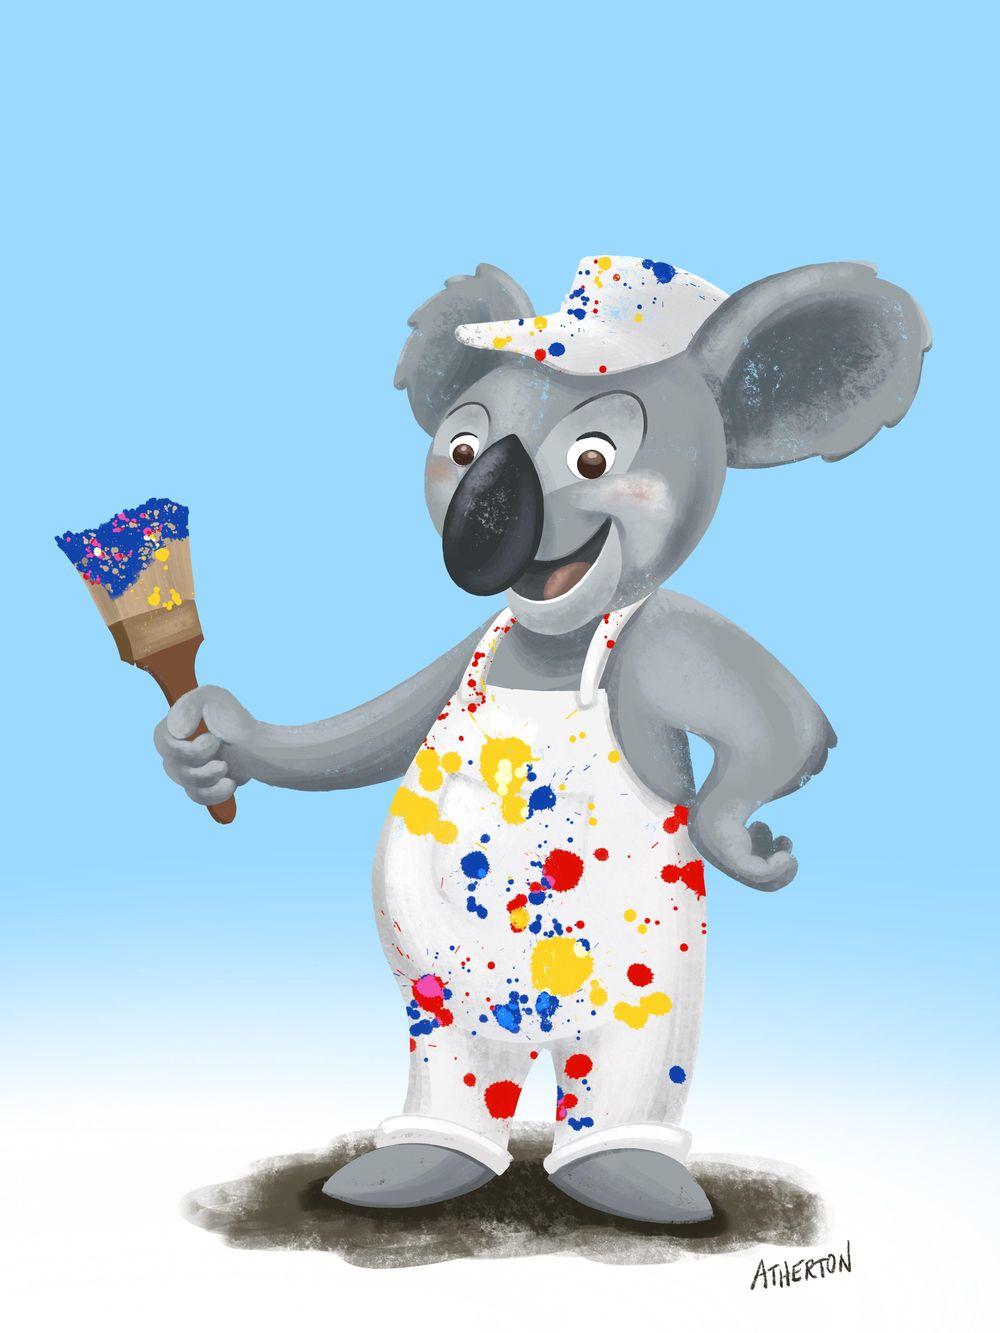 Koala painters inc. - image 4 - student project